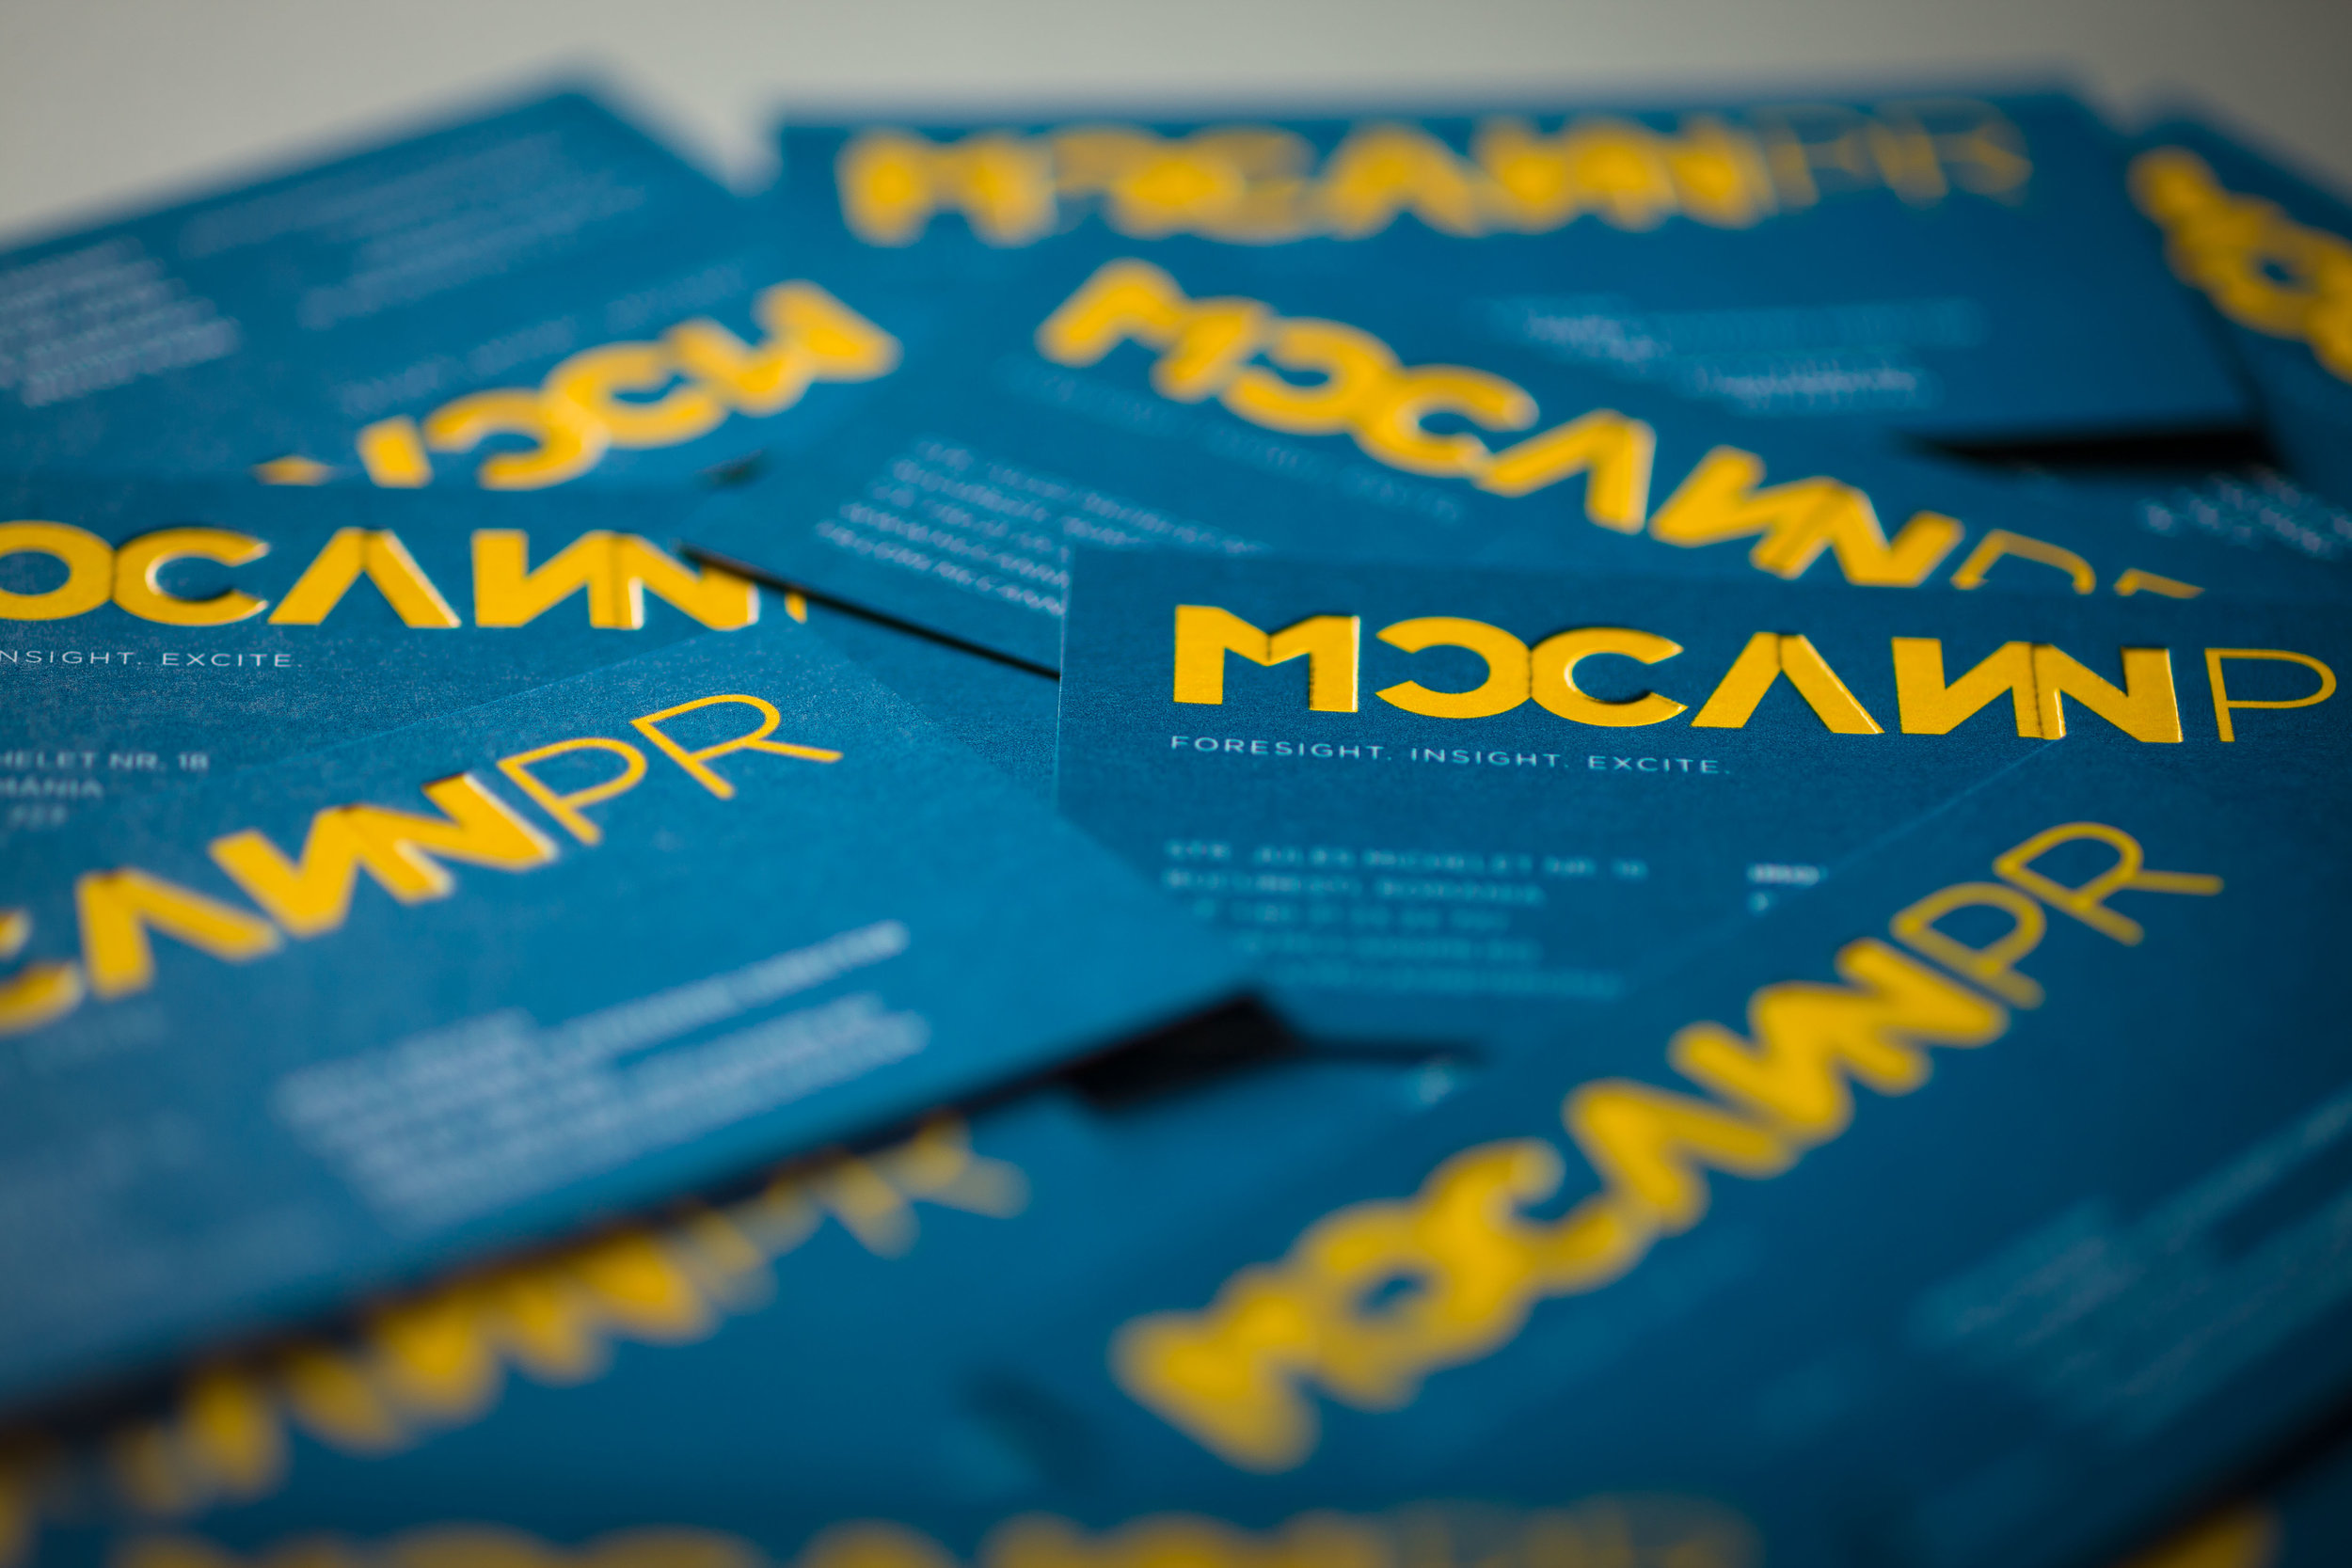 MCCANNPR_business_cards.jpeg